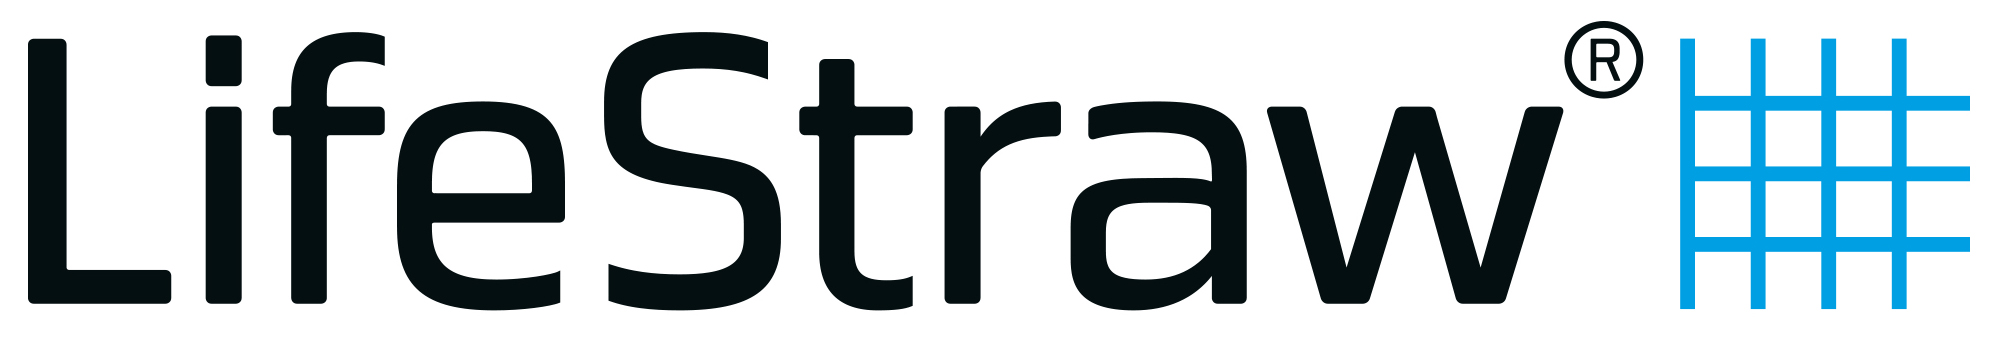 Lifestraw-logo.jpg